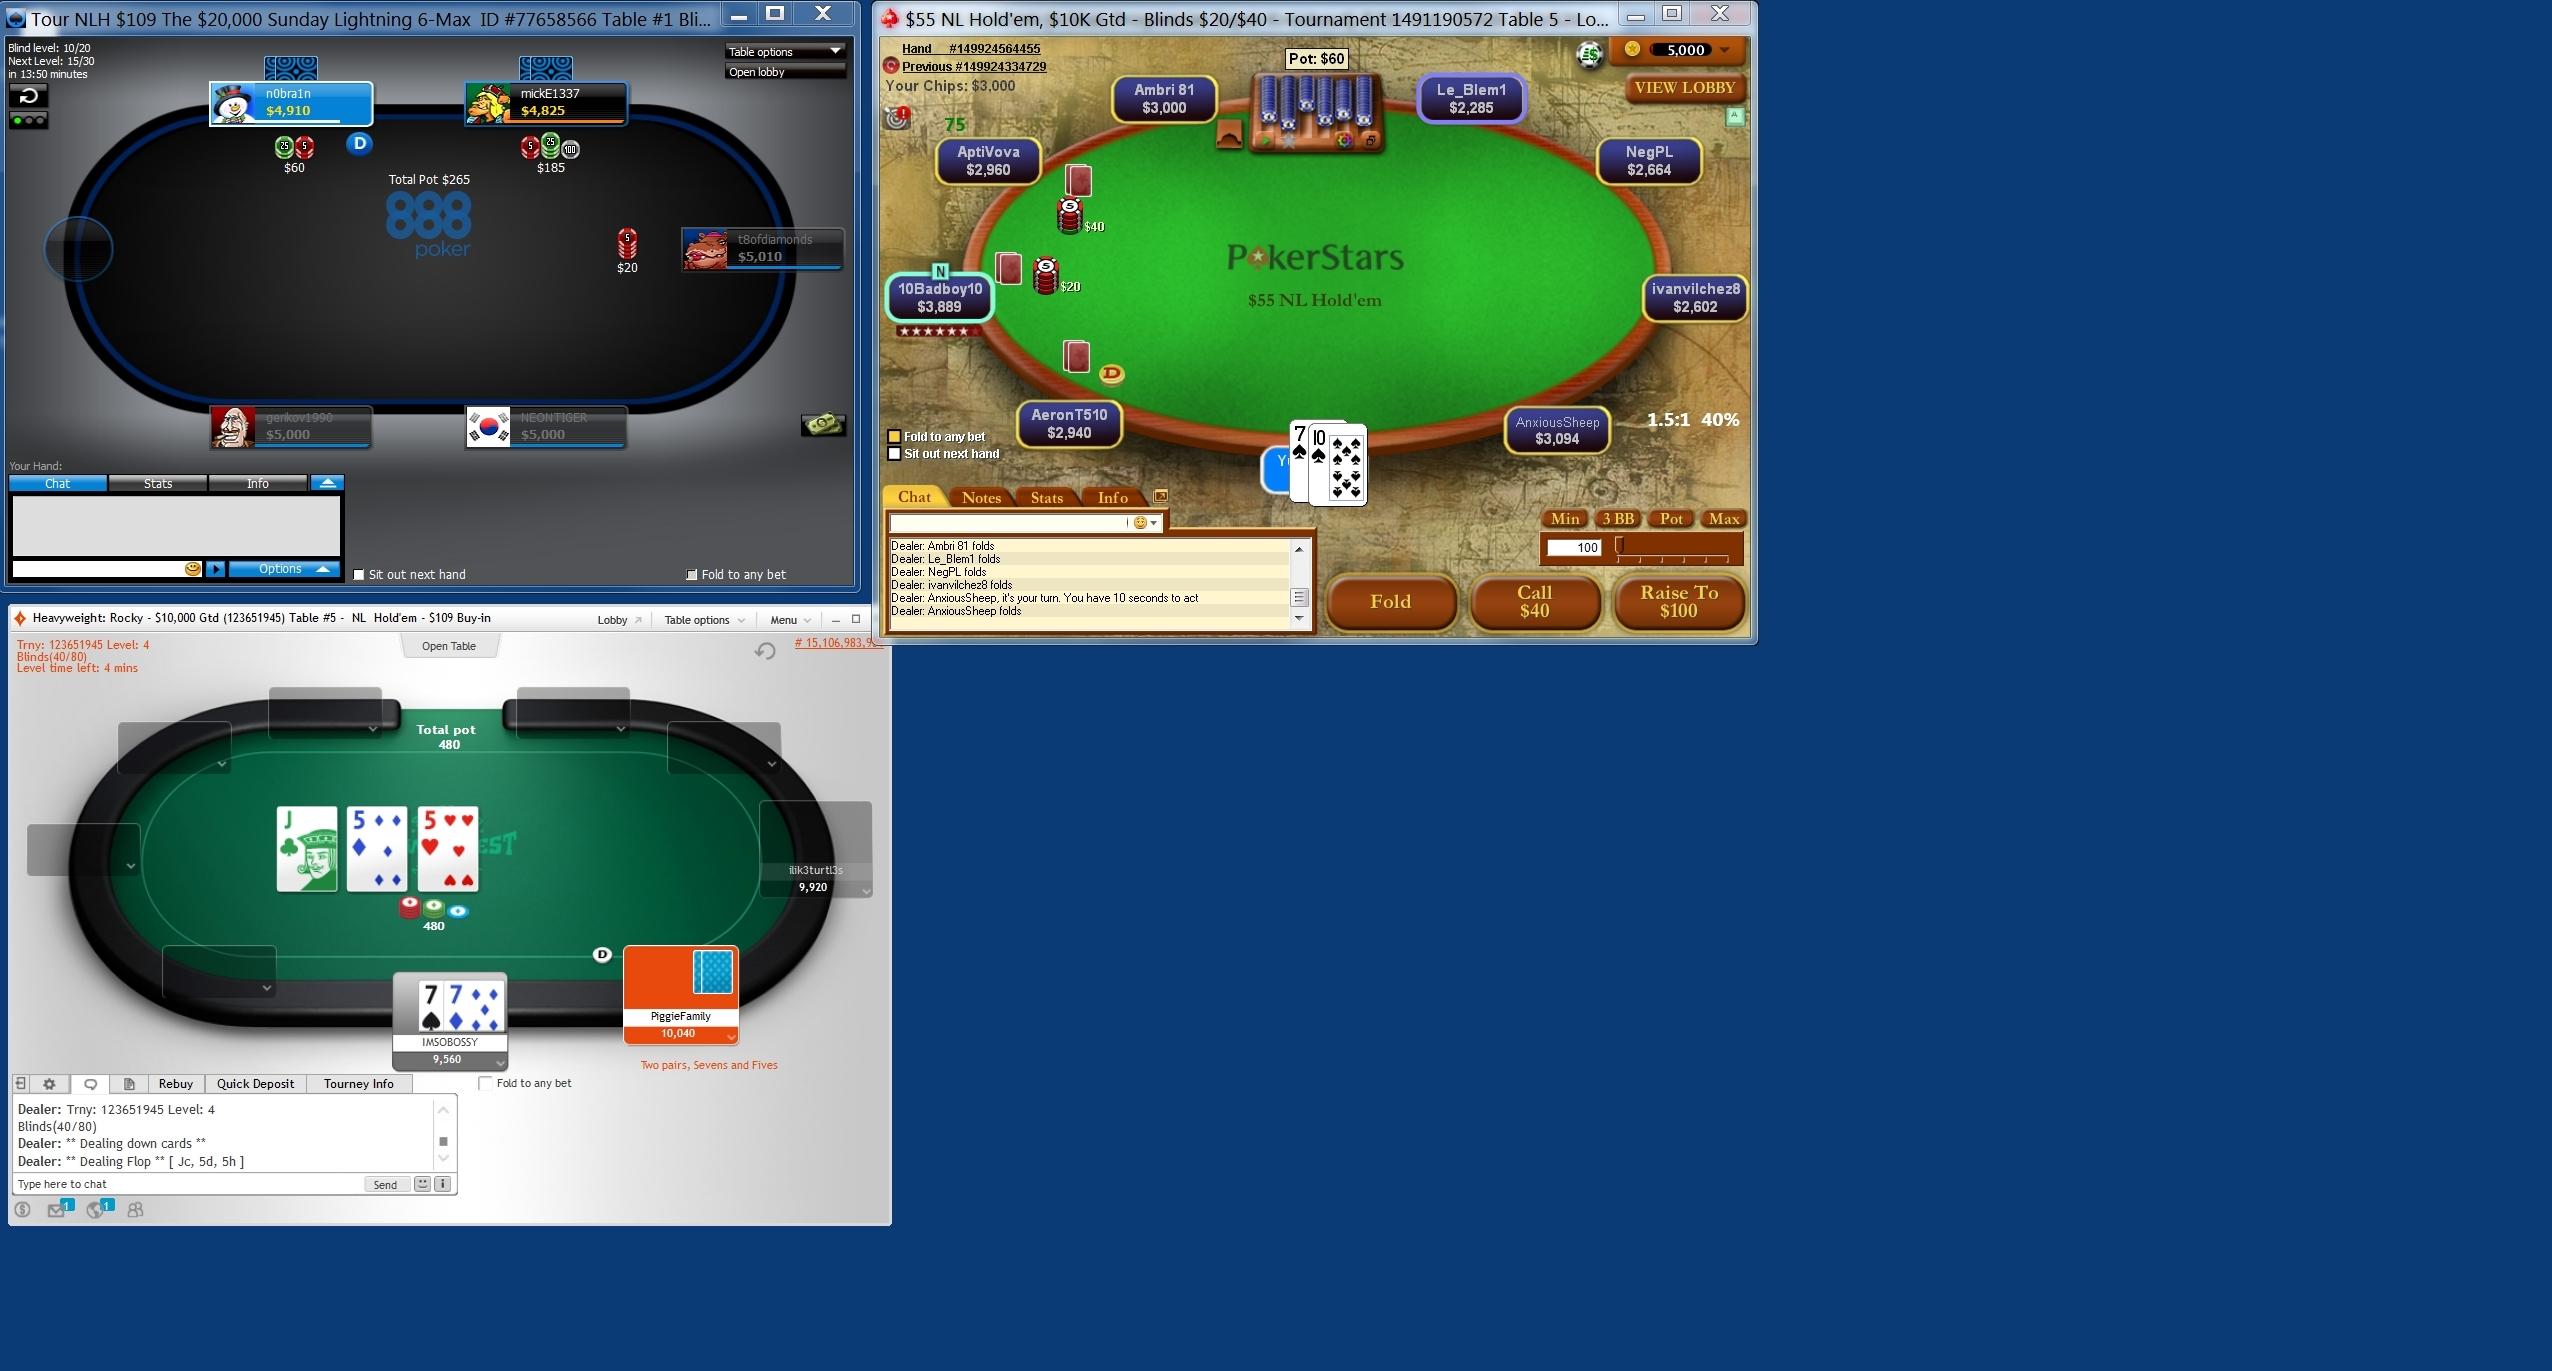 Yugiohpro poker stars